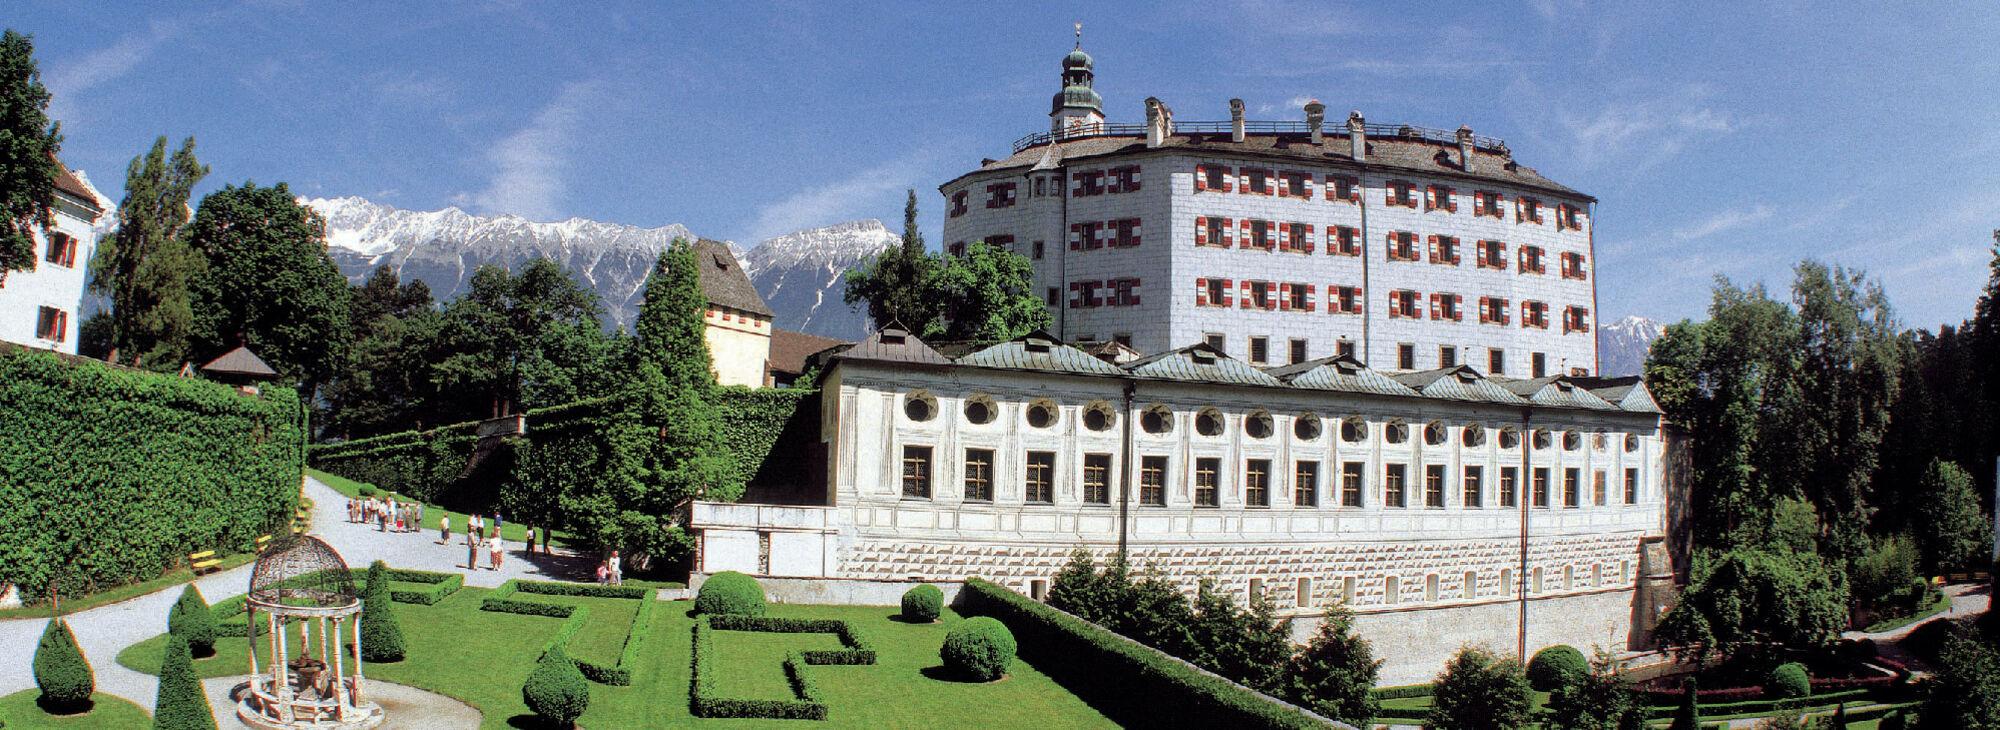 Schloss Ambras in Innsbruck